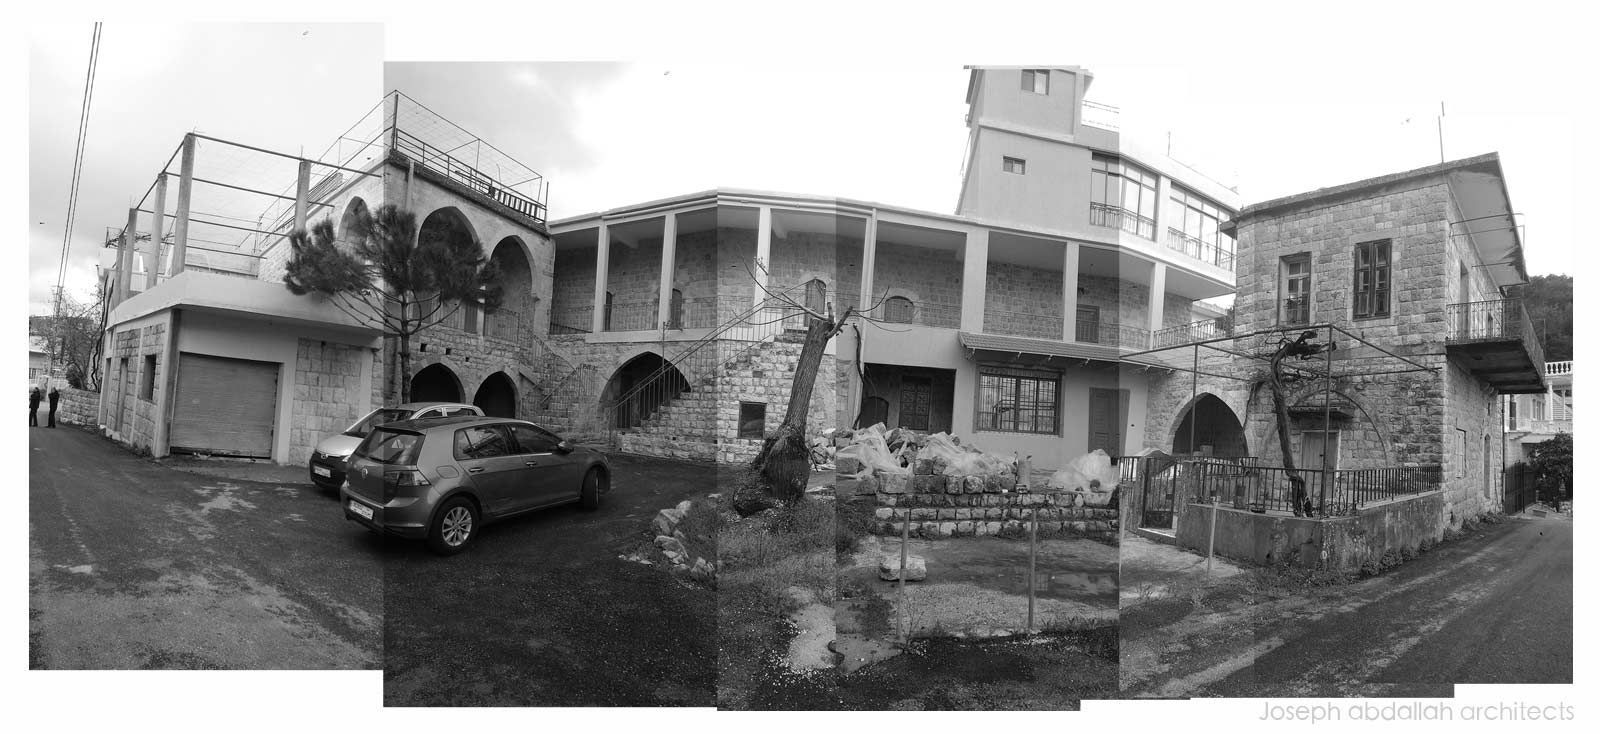 azoury-mounment-old-architecture-restoration-lebanon-joseph-abdallah-architects-1